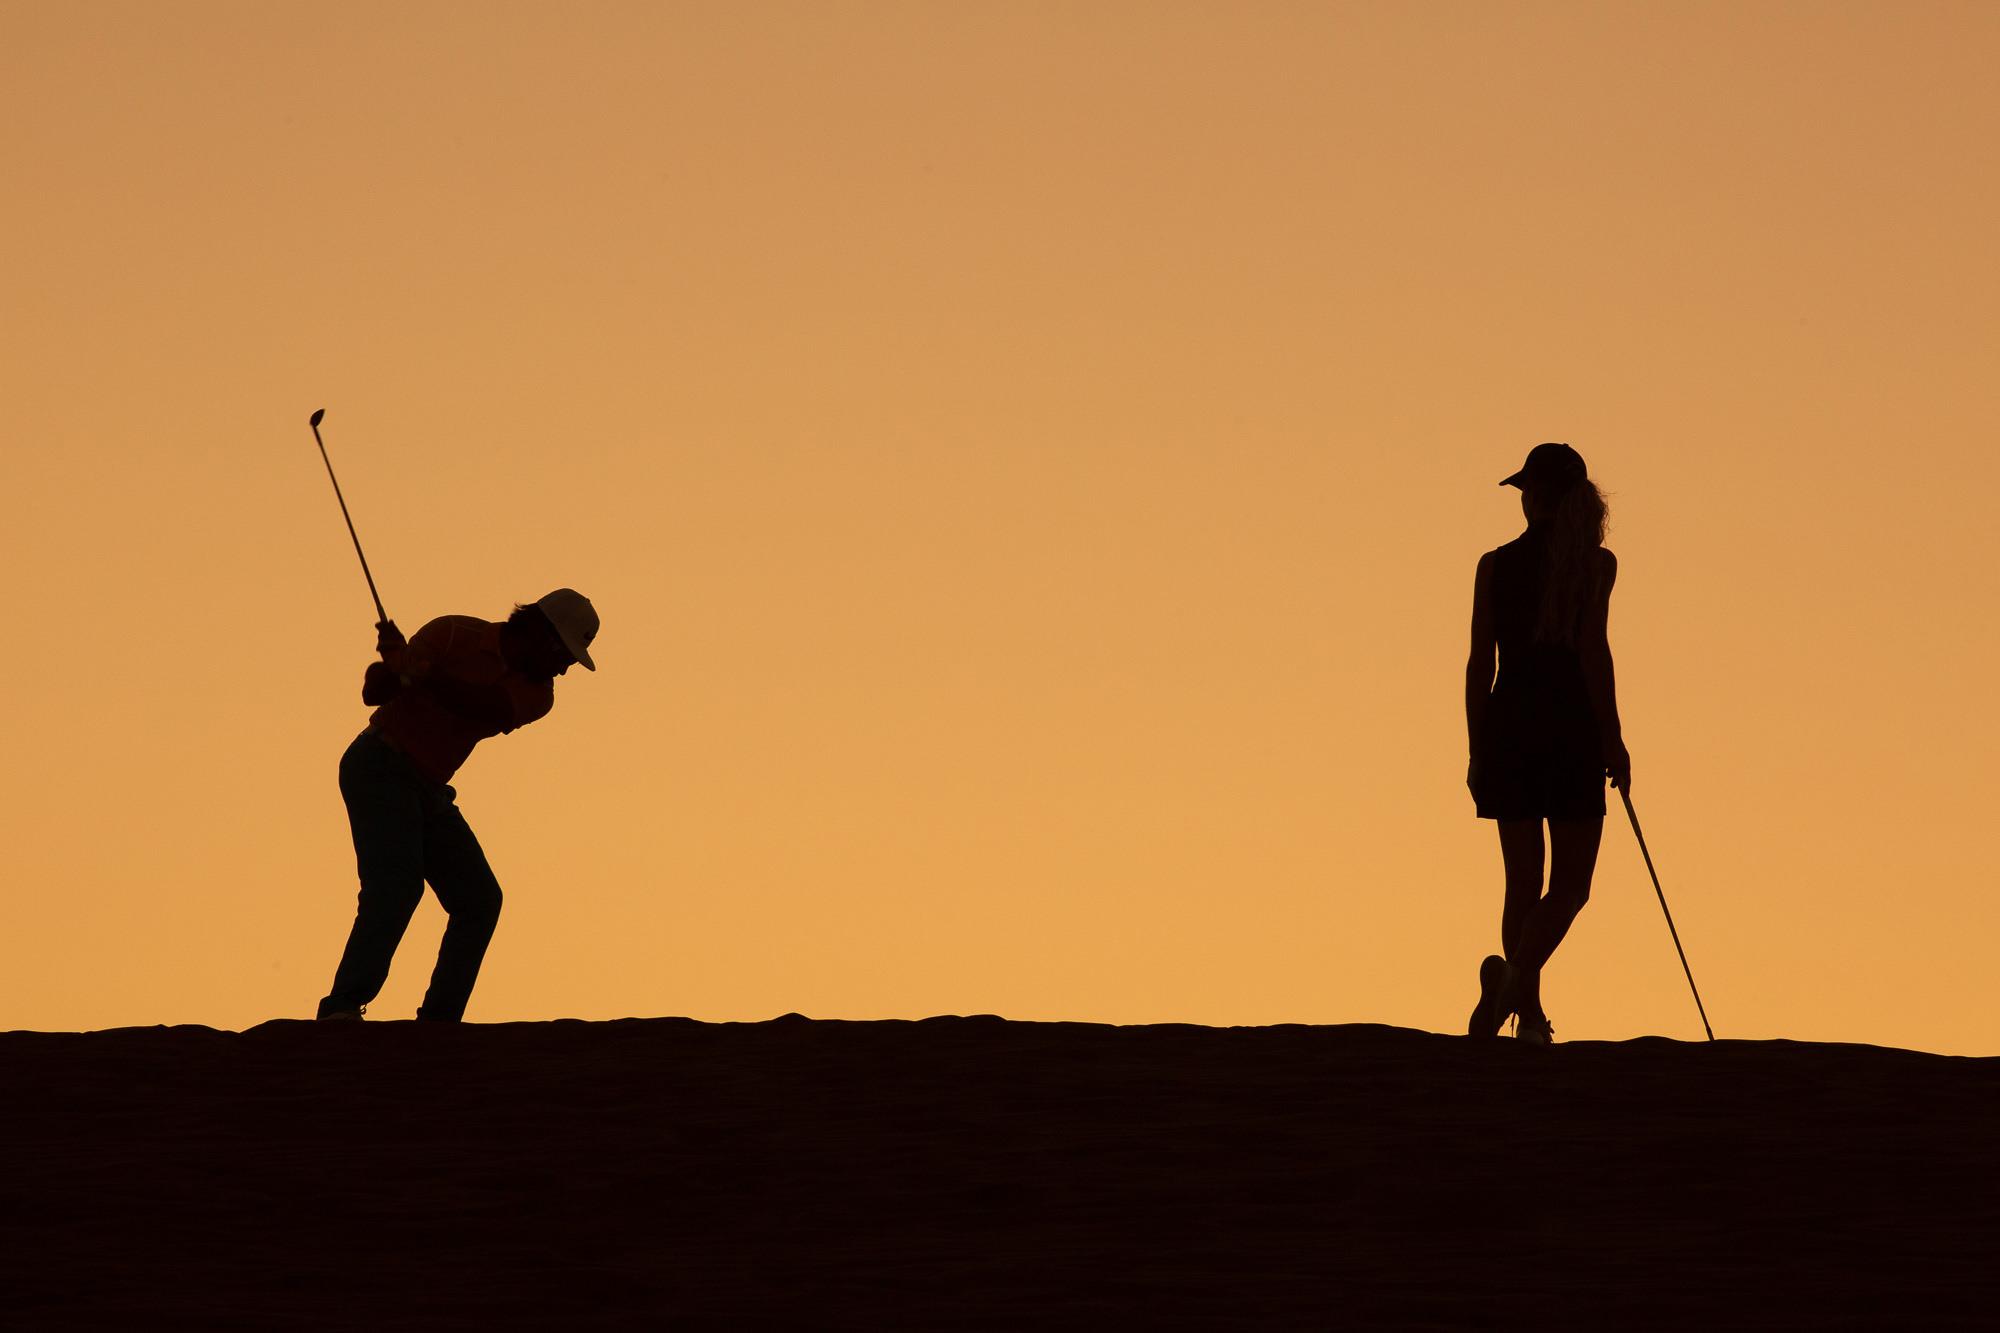 fotografo-de-bodas-las-palmas-gran-canaria-carlosglez-unbuenmomento-gran-canaria-golf-dunas-147